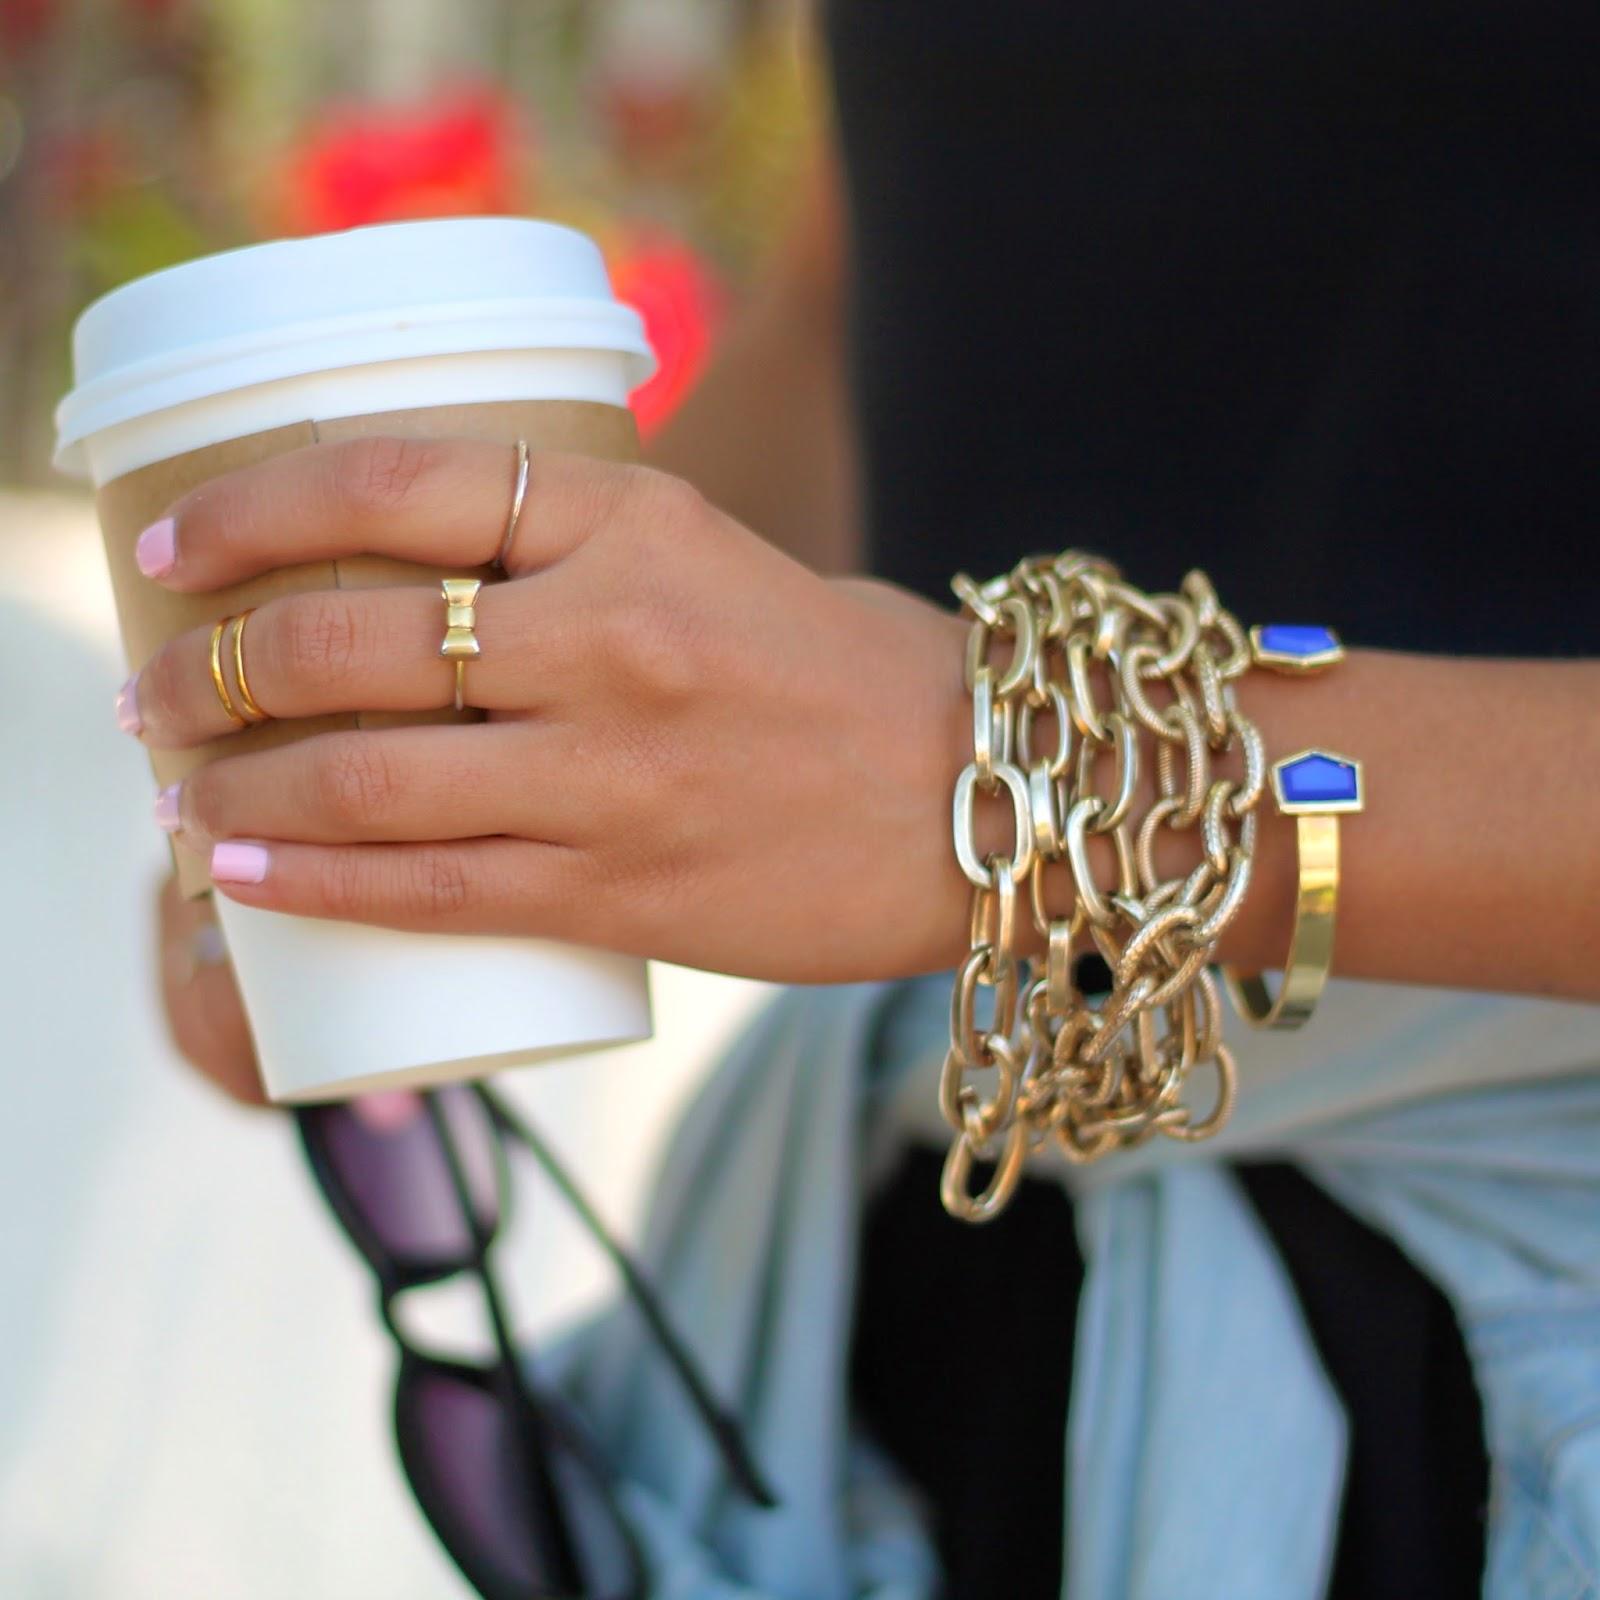 capwell sole society bracelets